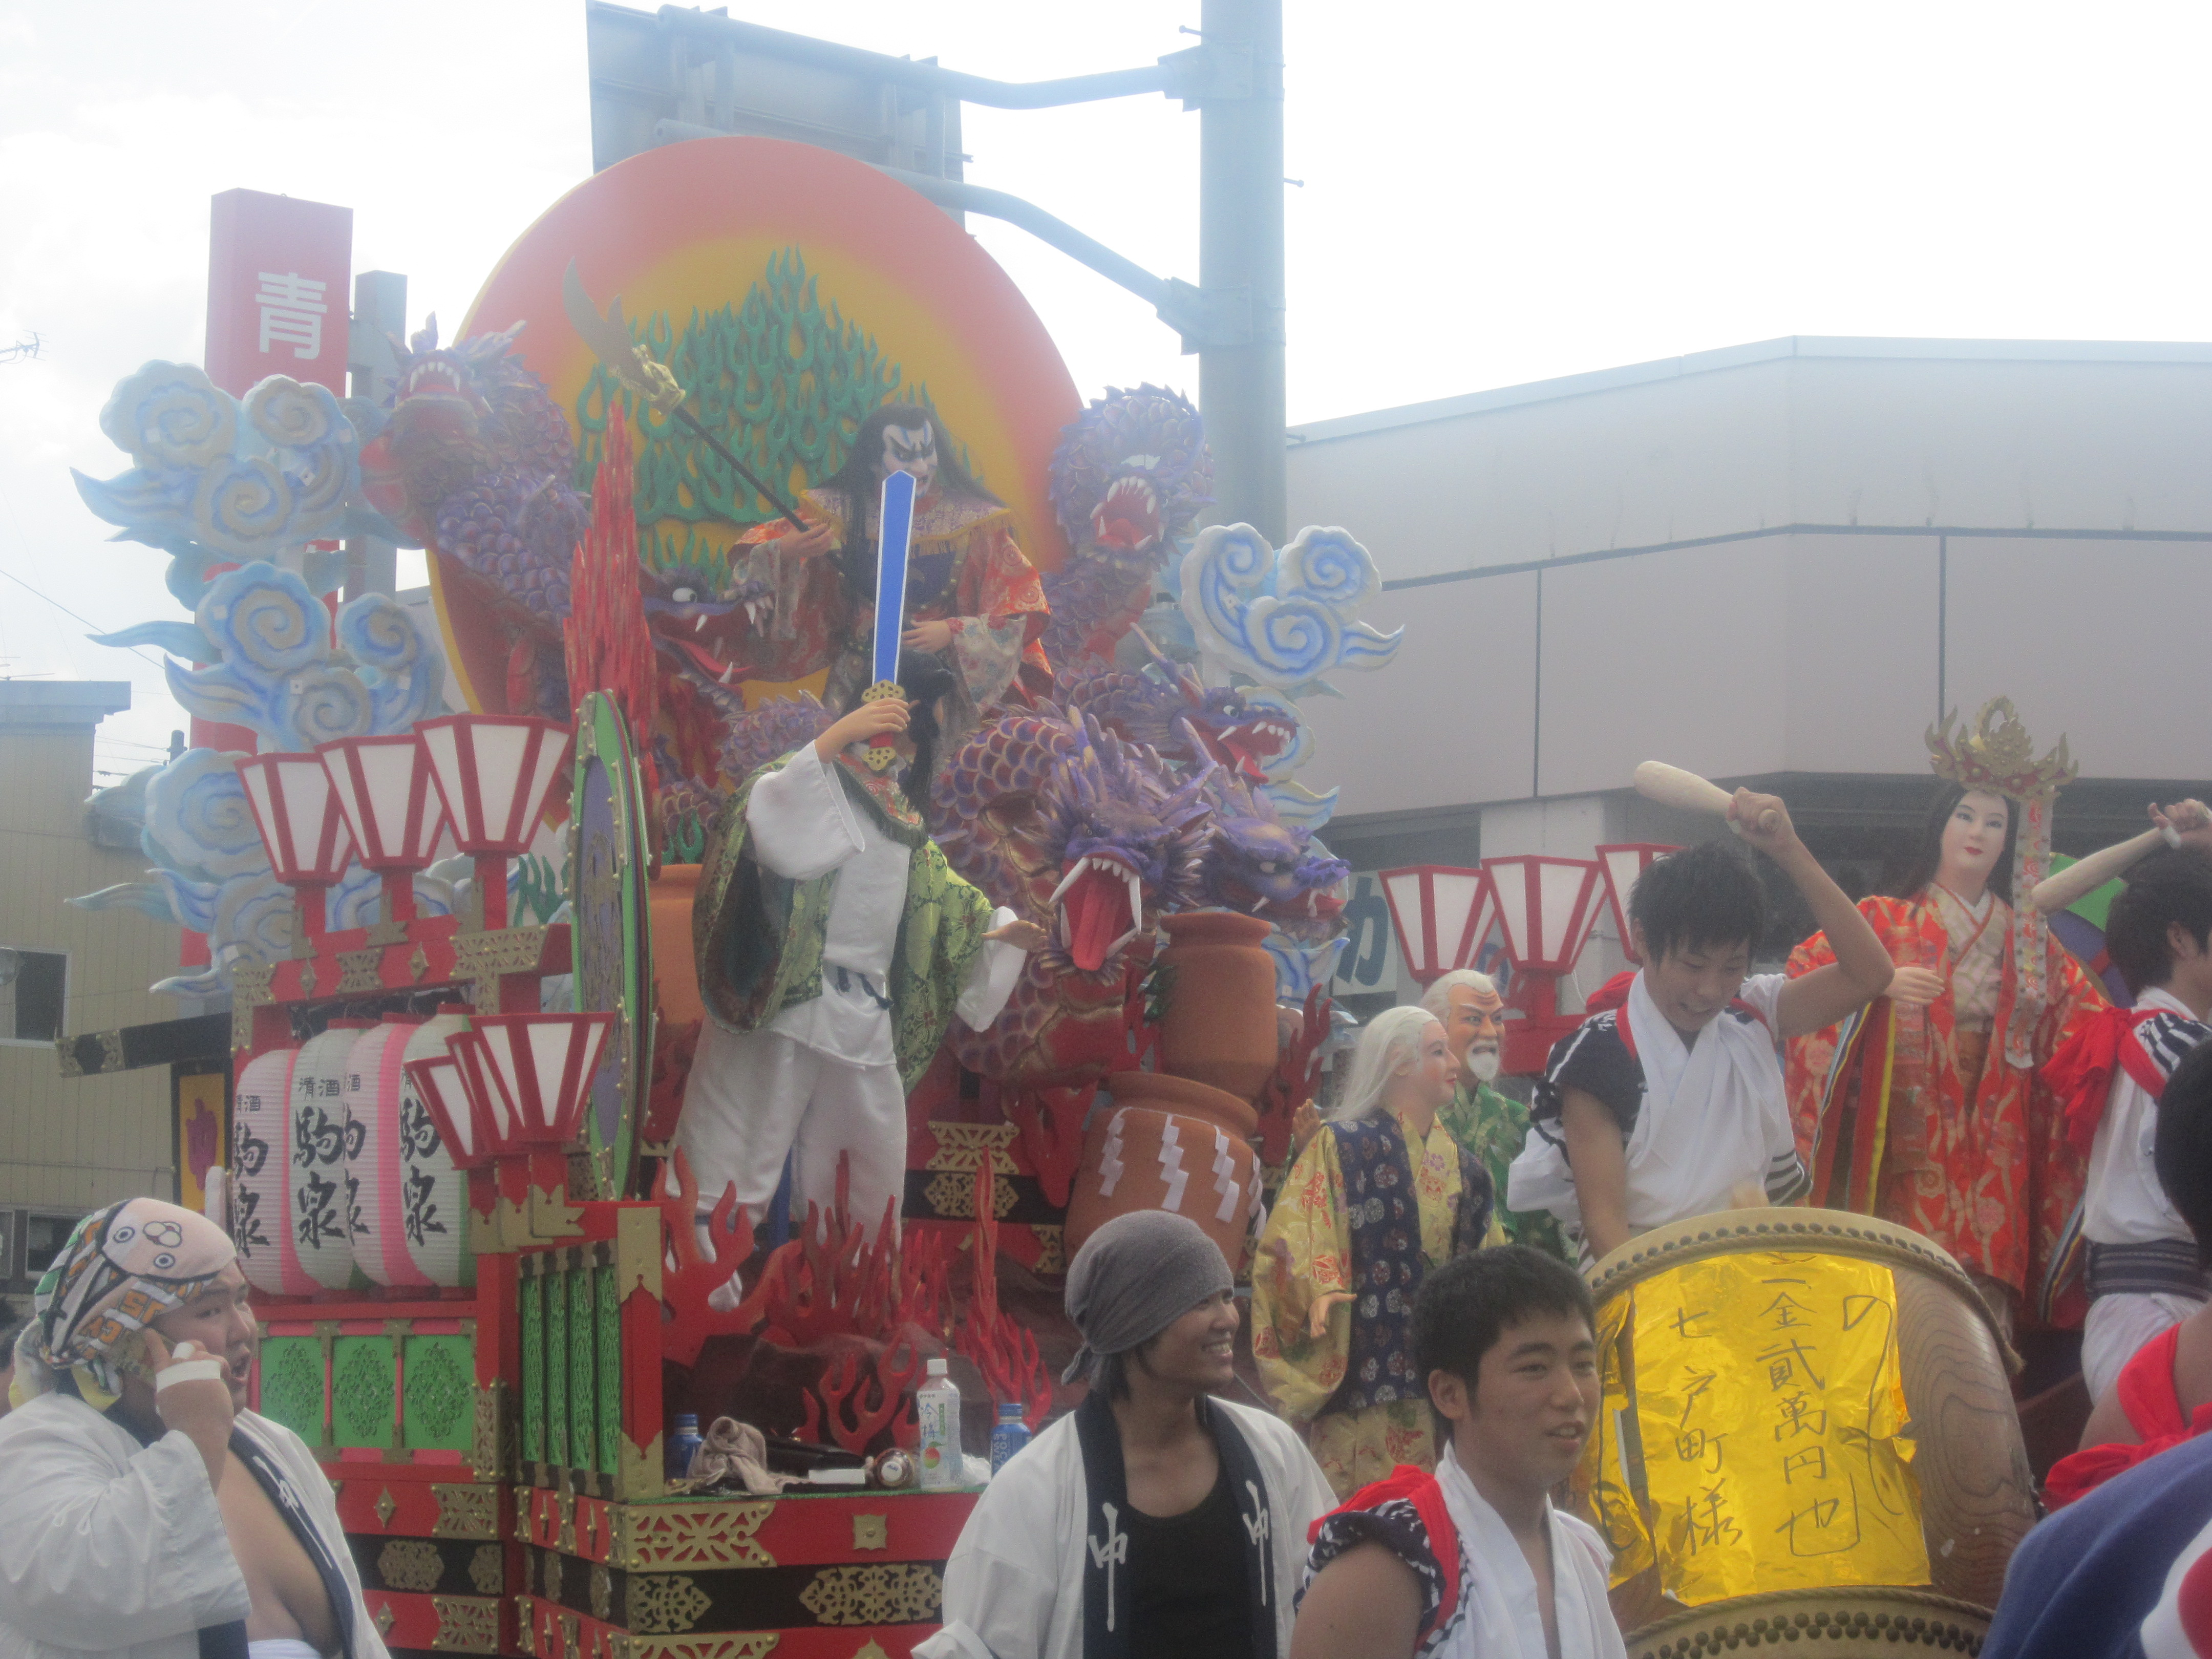 IMG 4242 - 麻布十番納涼祭り25,26日(七戸町出店)